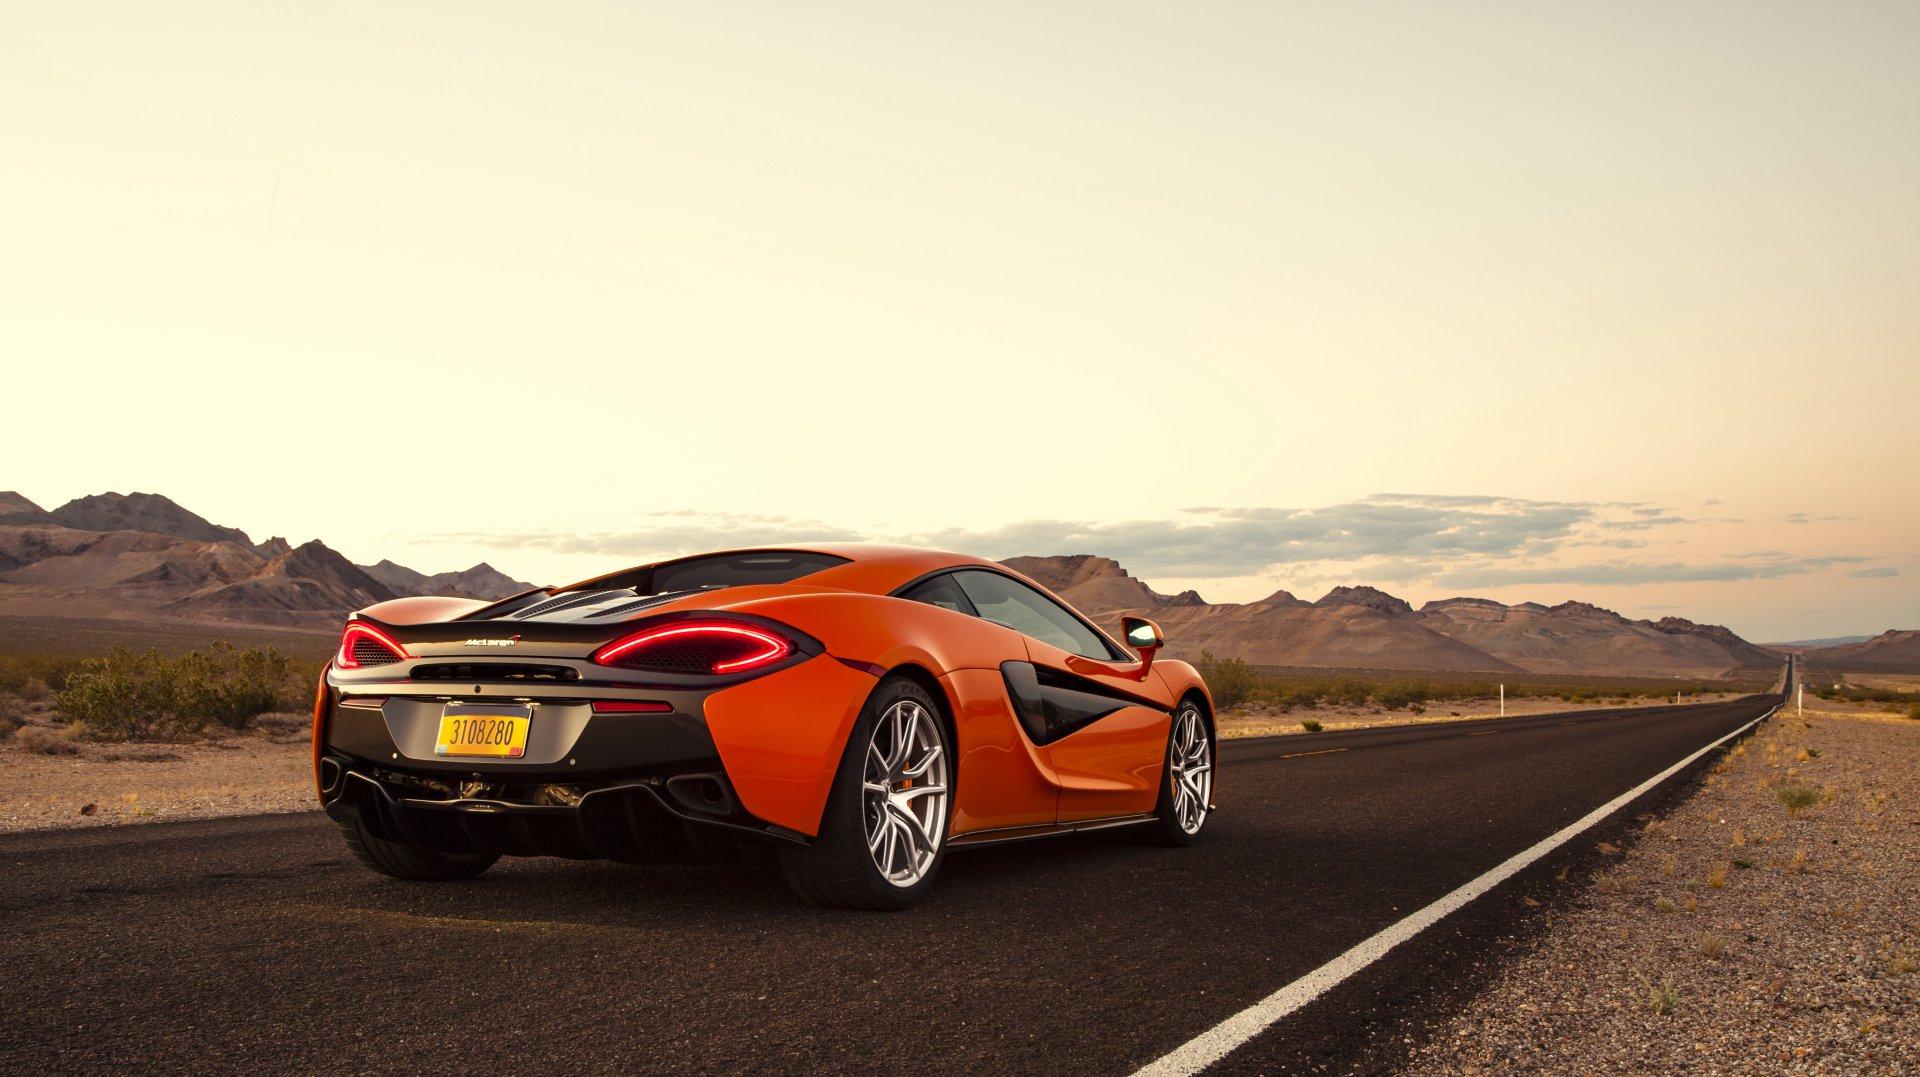 Vehicles - McLaren 570S  McLaren Car Vehicle Supercar Orange Car Wallpaper